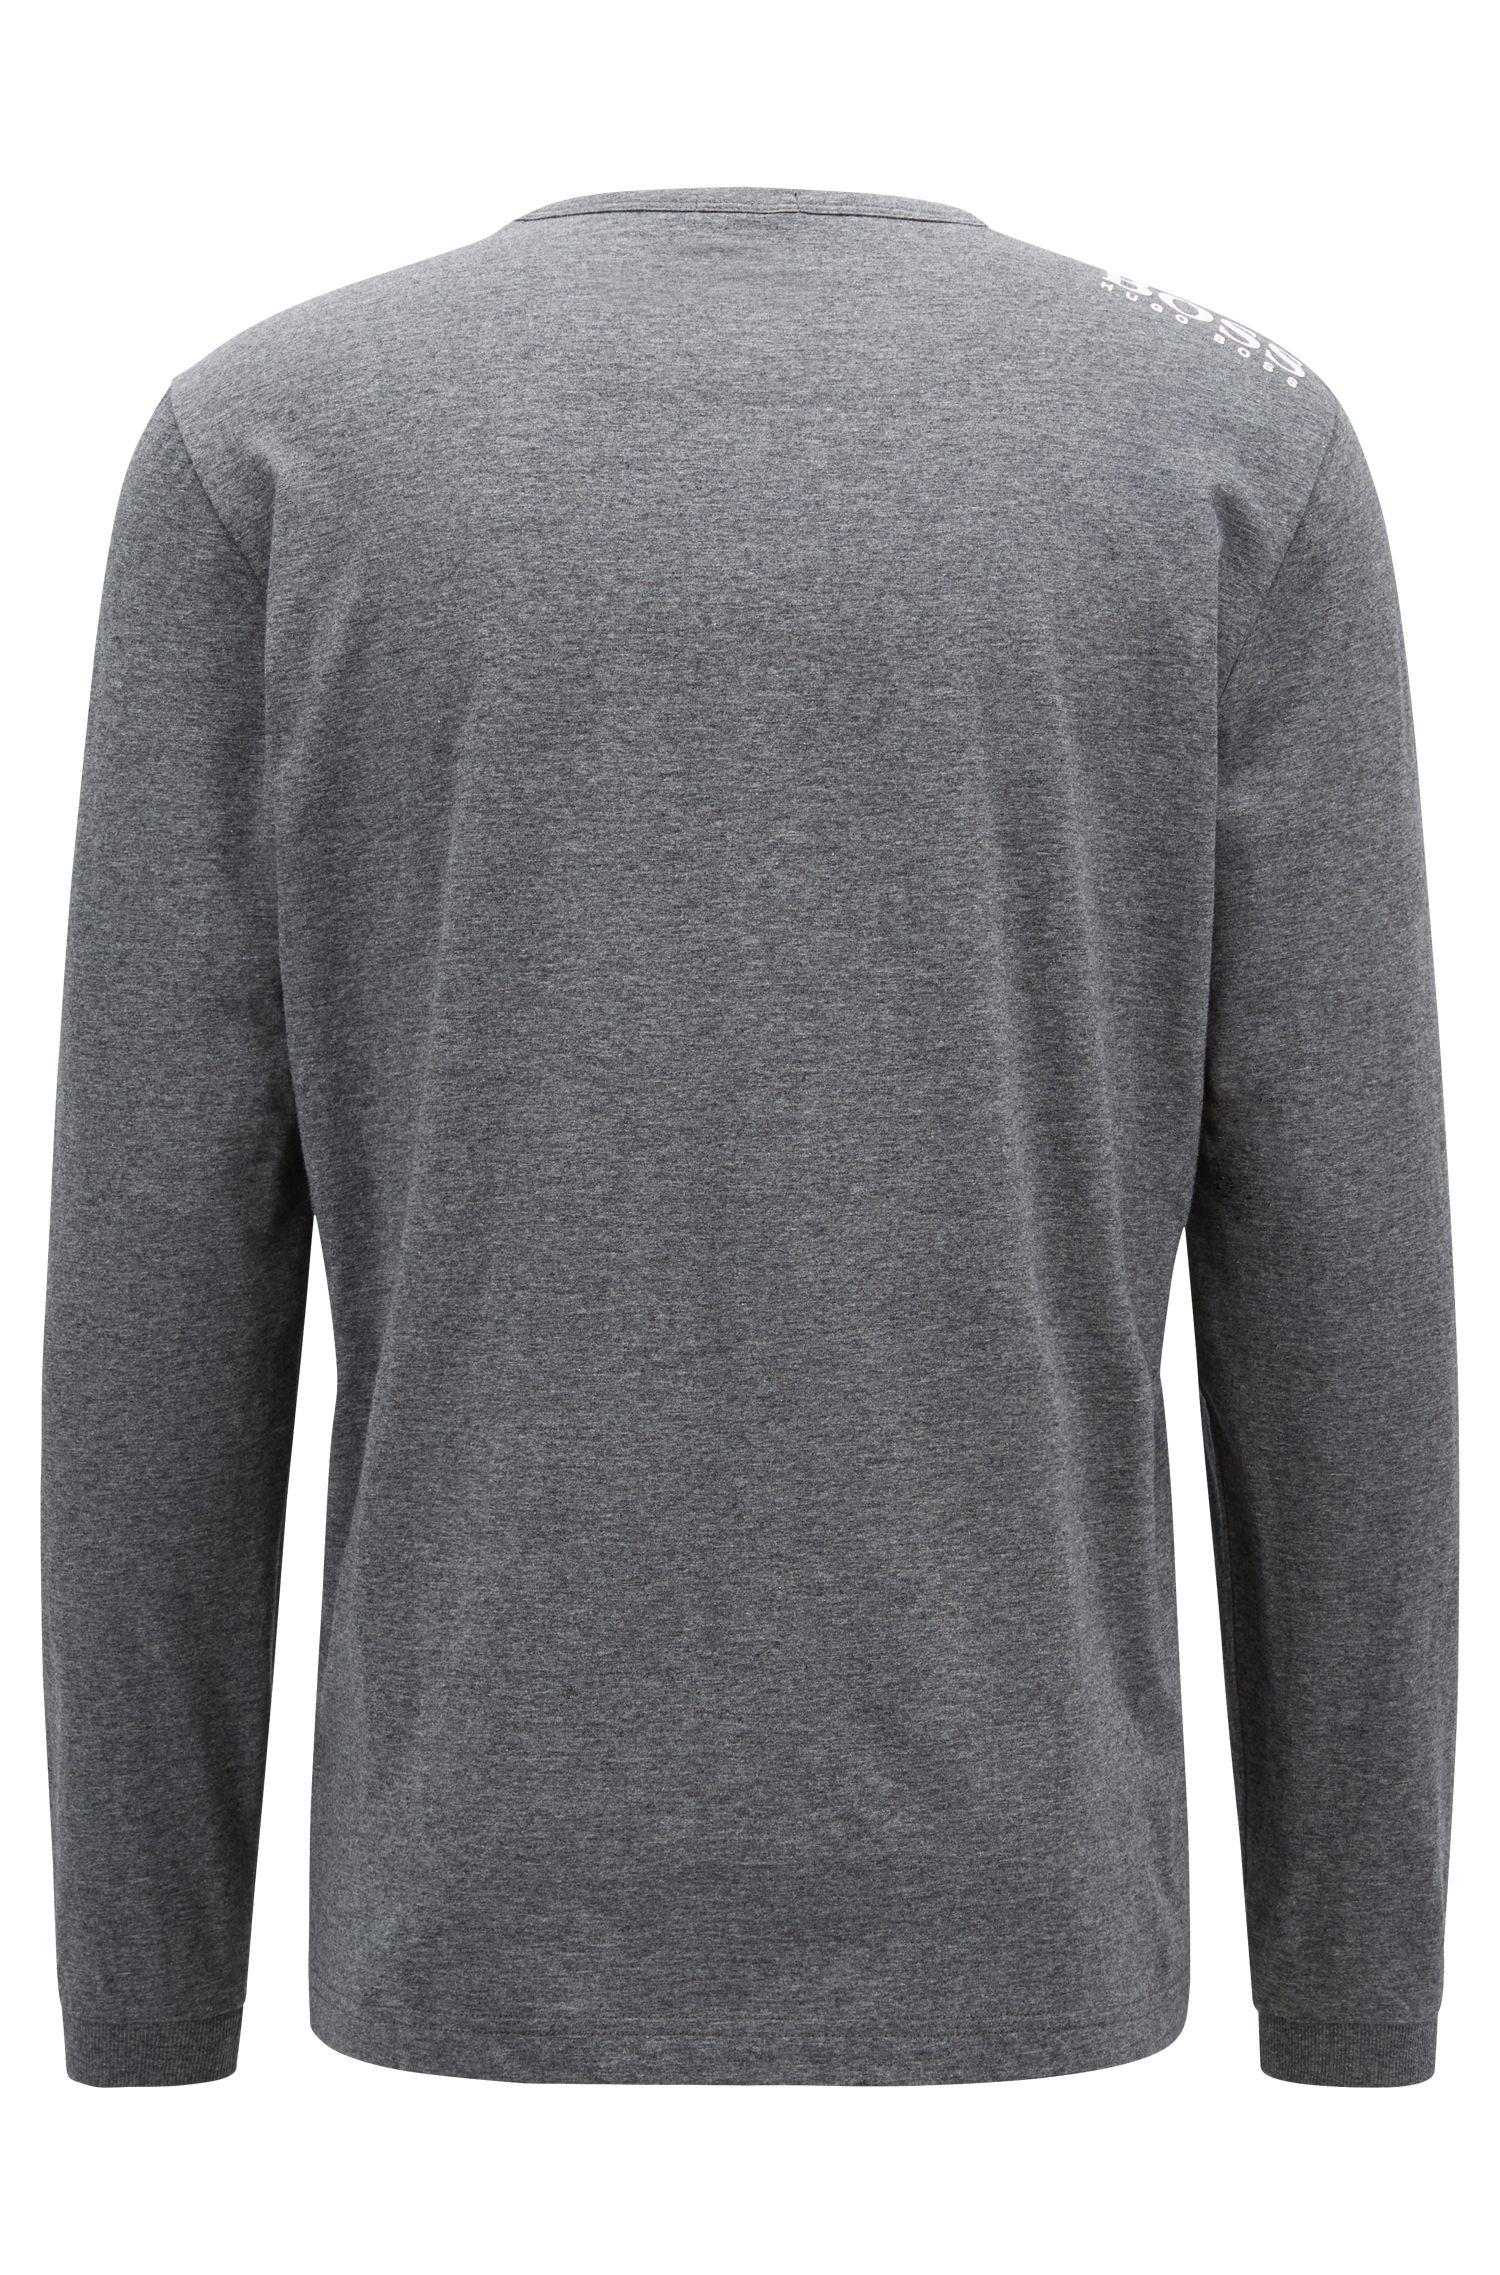 Longsleeve aus Jersey mit V-Ausschnitt und Logo, Grau